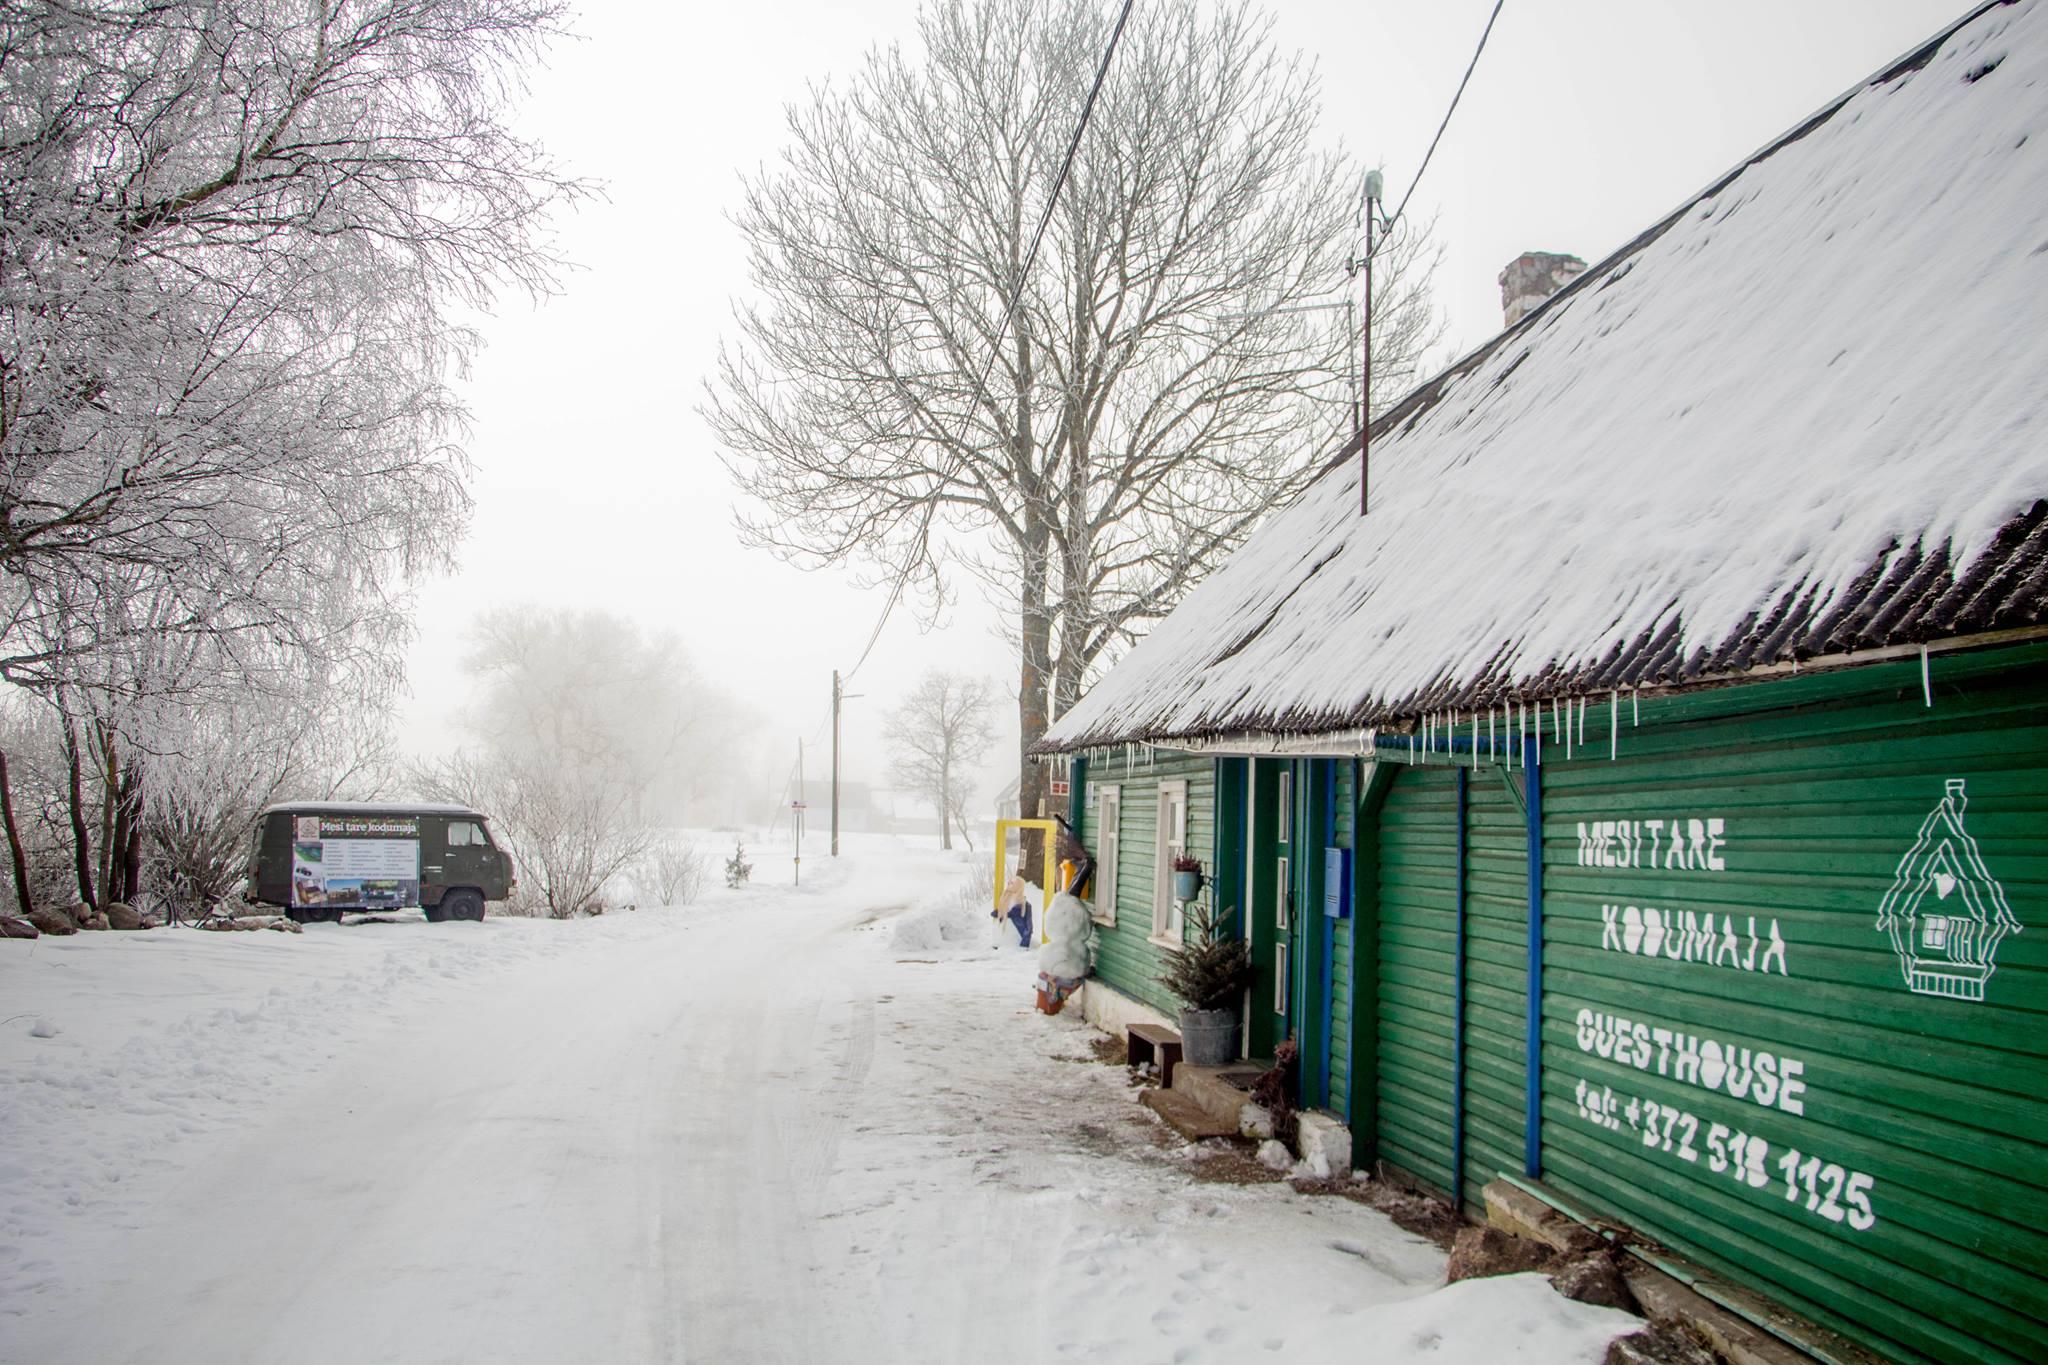 Mesi tare talvel